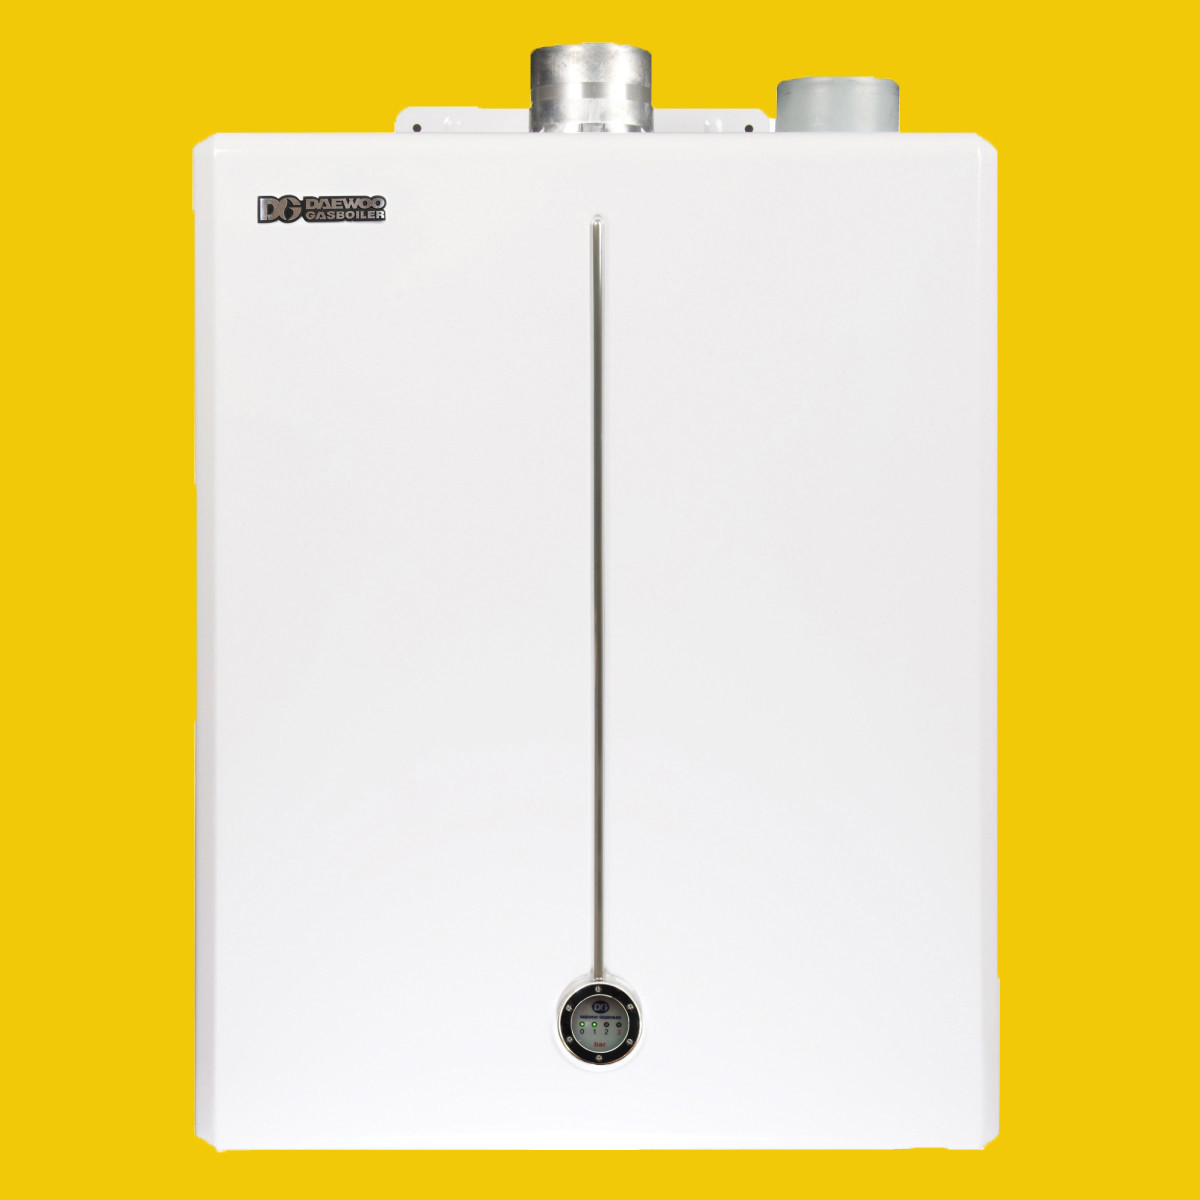 Газовый котел Daewoo DGB-400 MSC (46.5кВт)